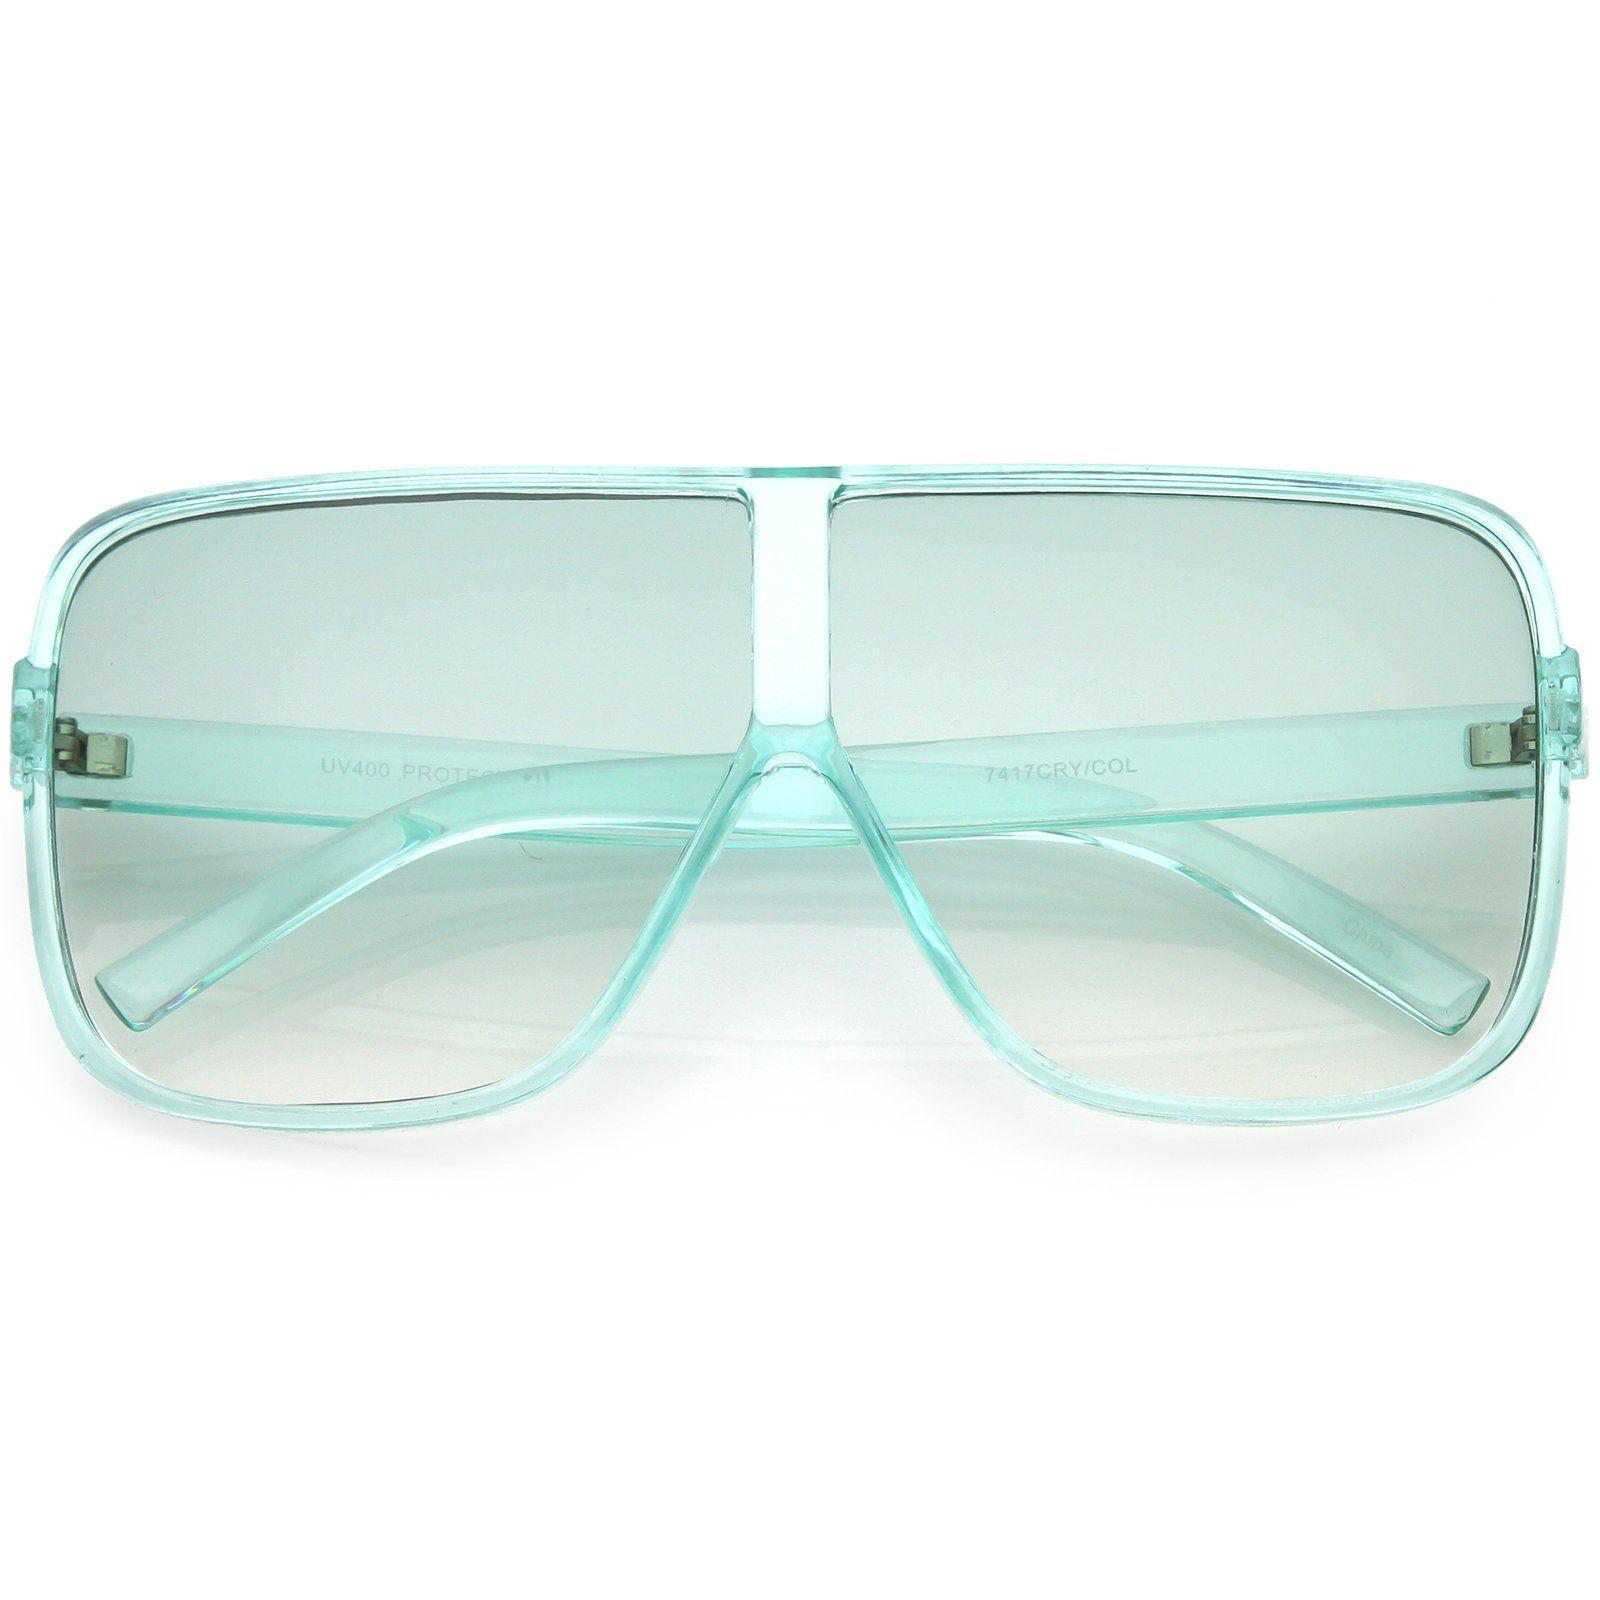 Oversize Translucent Square Sunglasses Flat Top Color Tinted Lens 69mm Colour Tint Flats Top Square Sunglasses